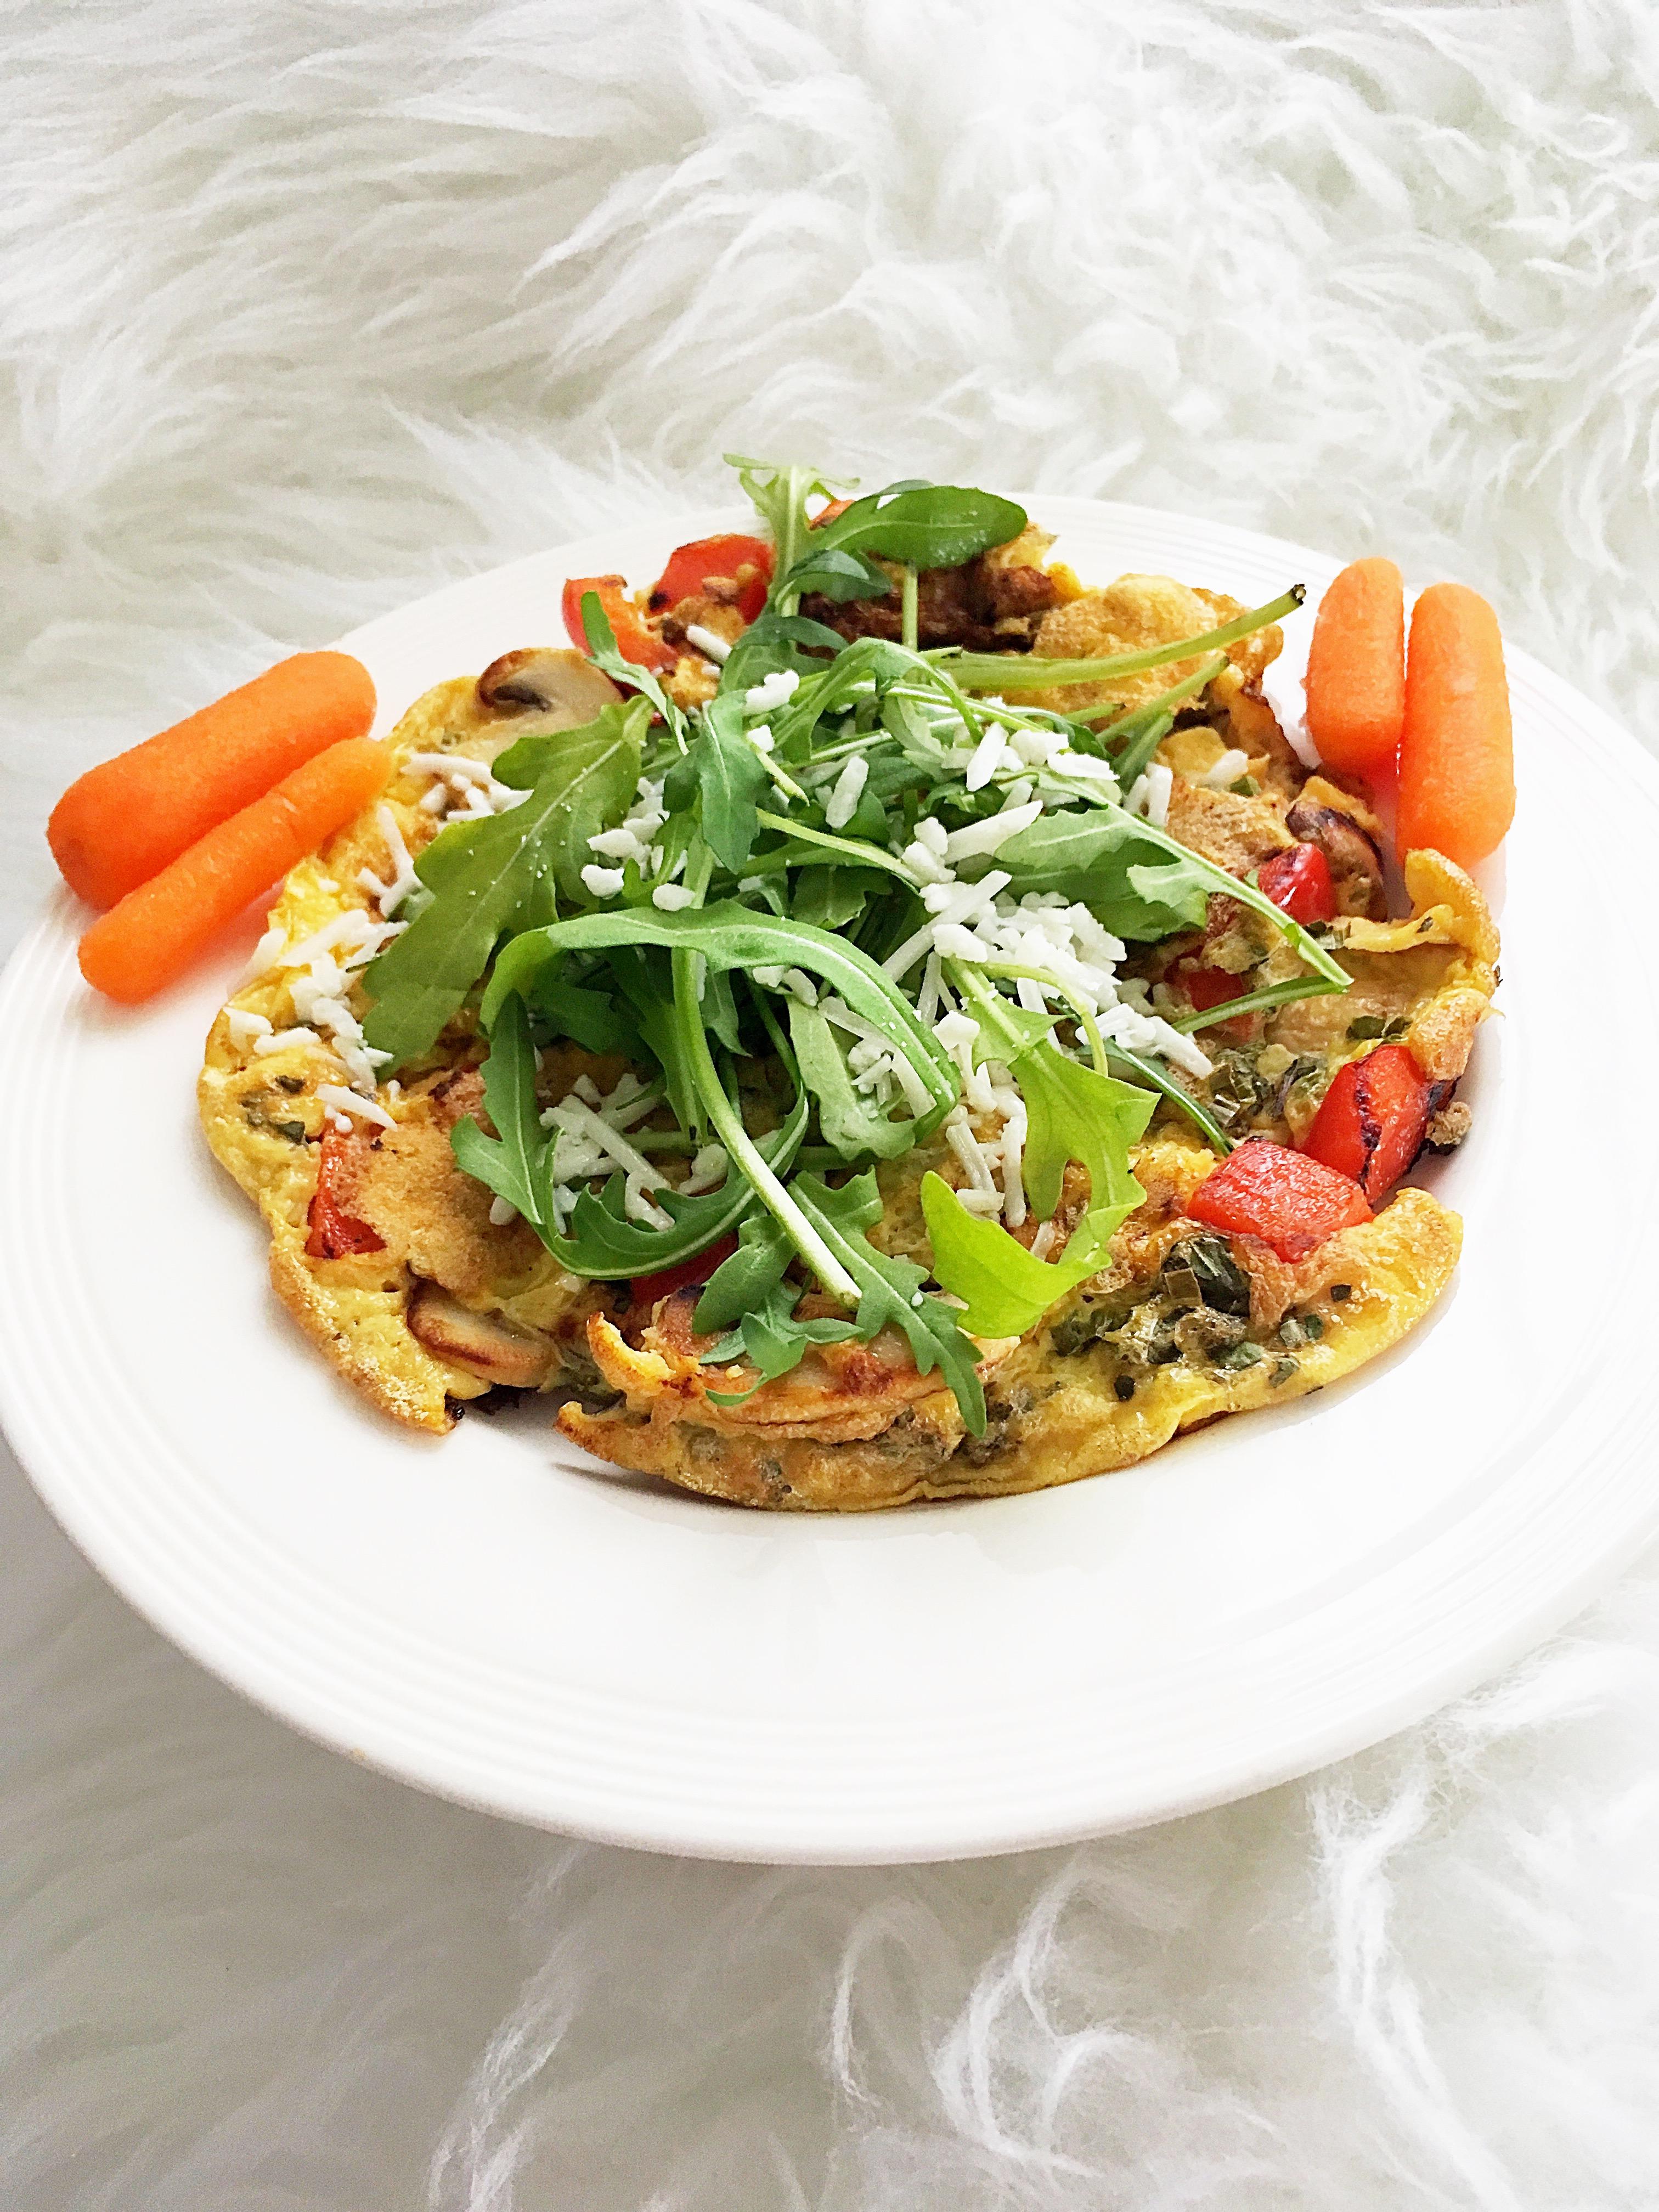 ❤️ Lunch Omelet